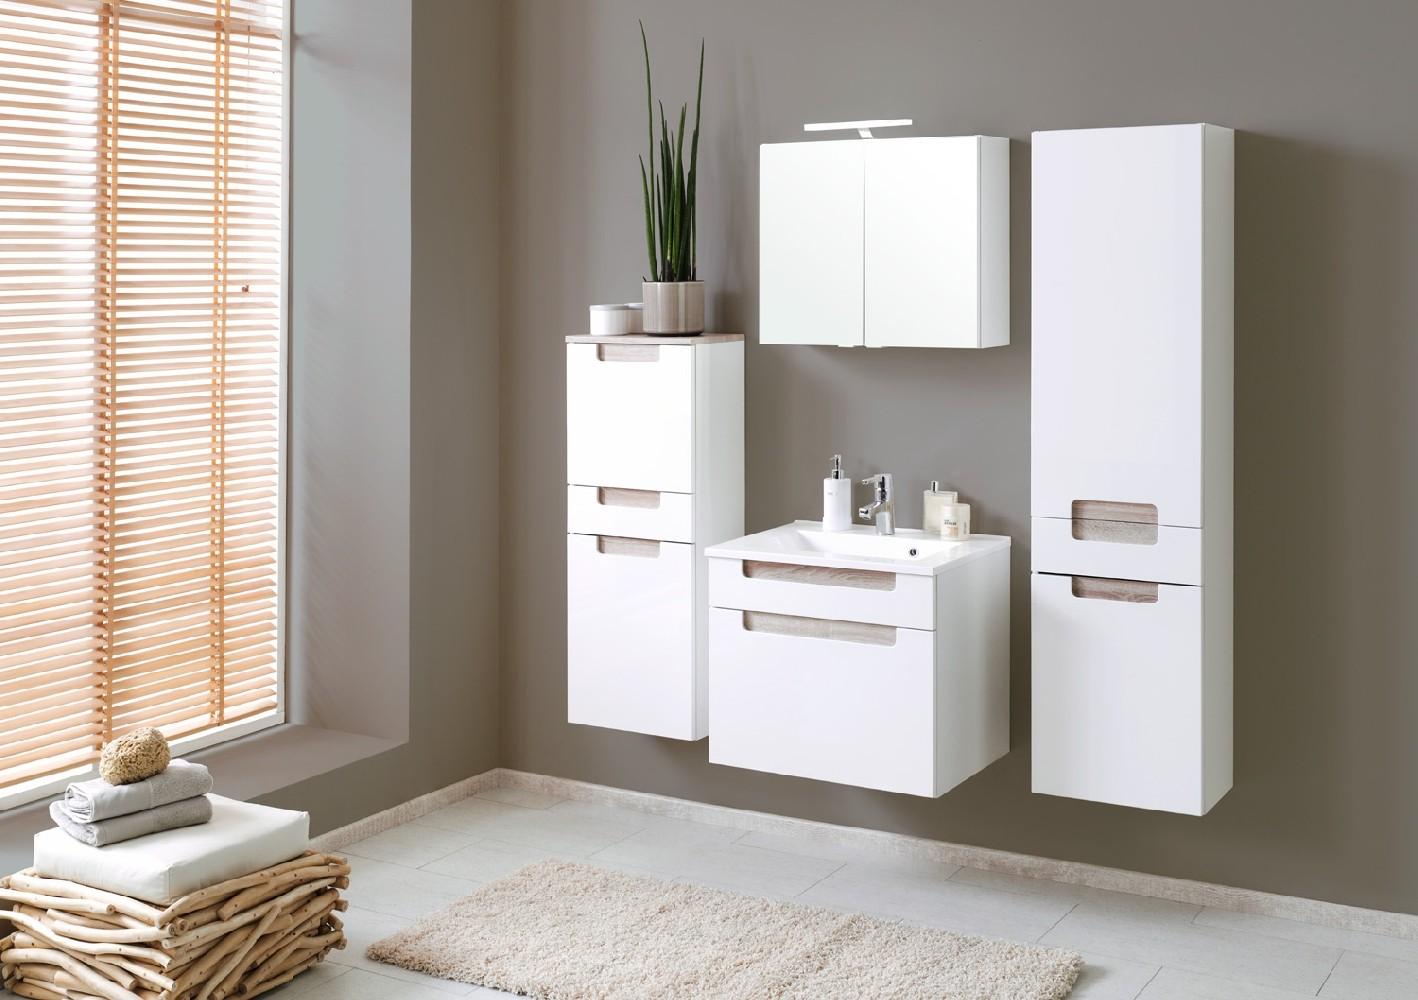 neu badezimmer h ngeschrank siena badezimmerschrank weiss. Black Bedroom Furniture Sets. Home Design Ideas